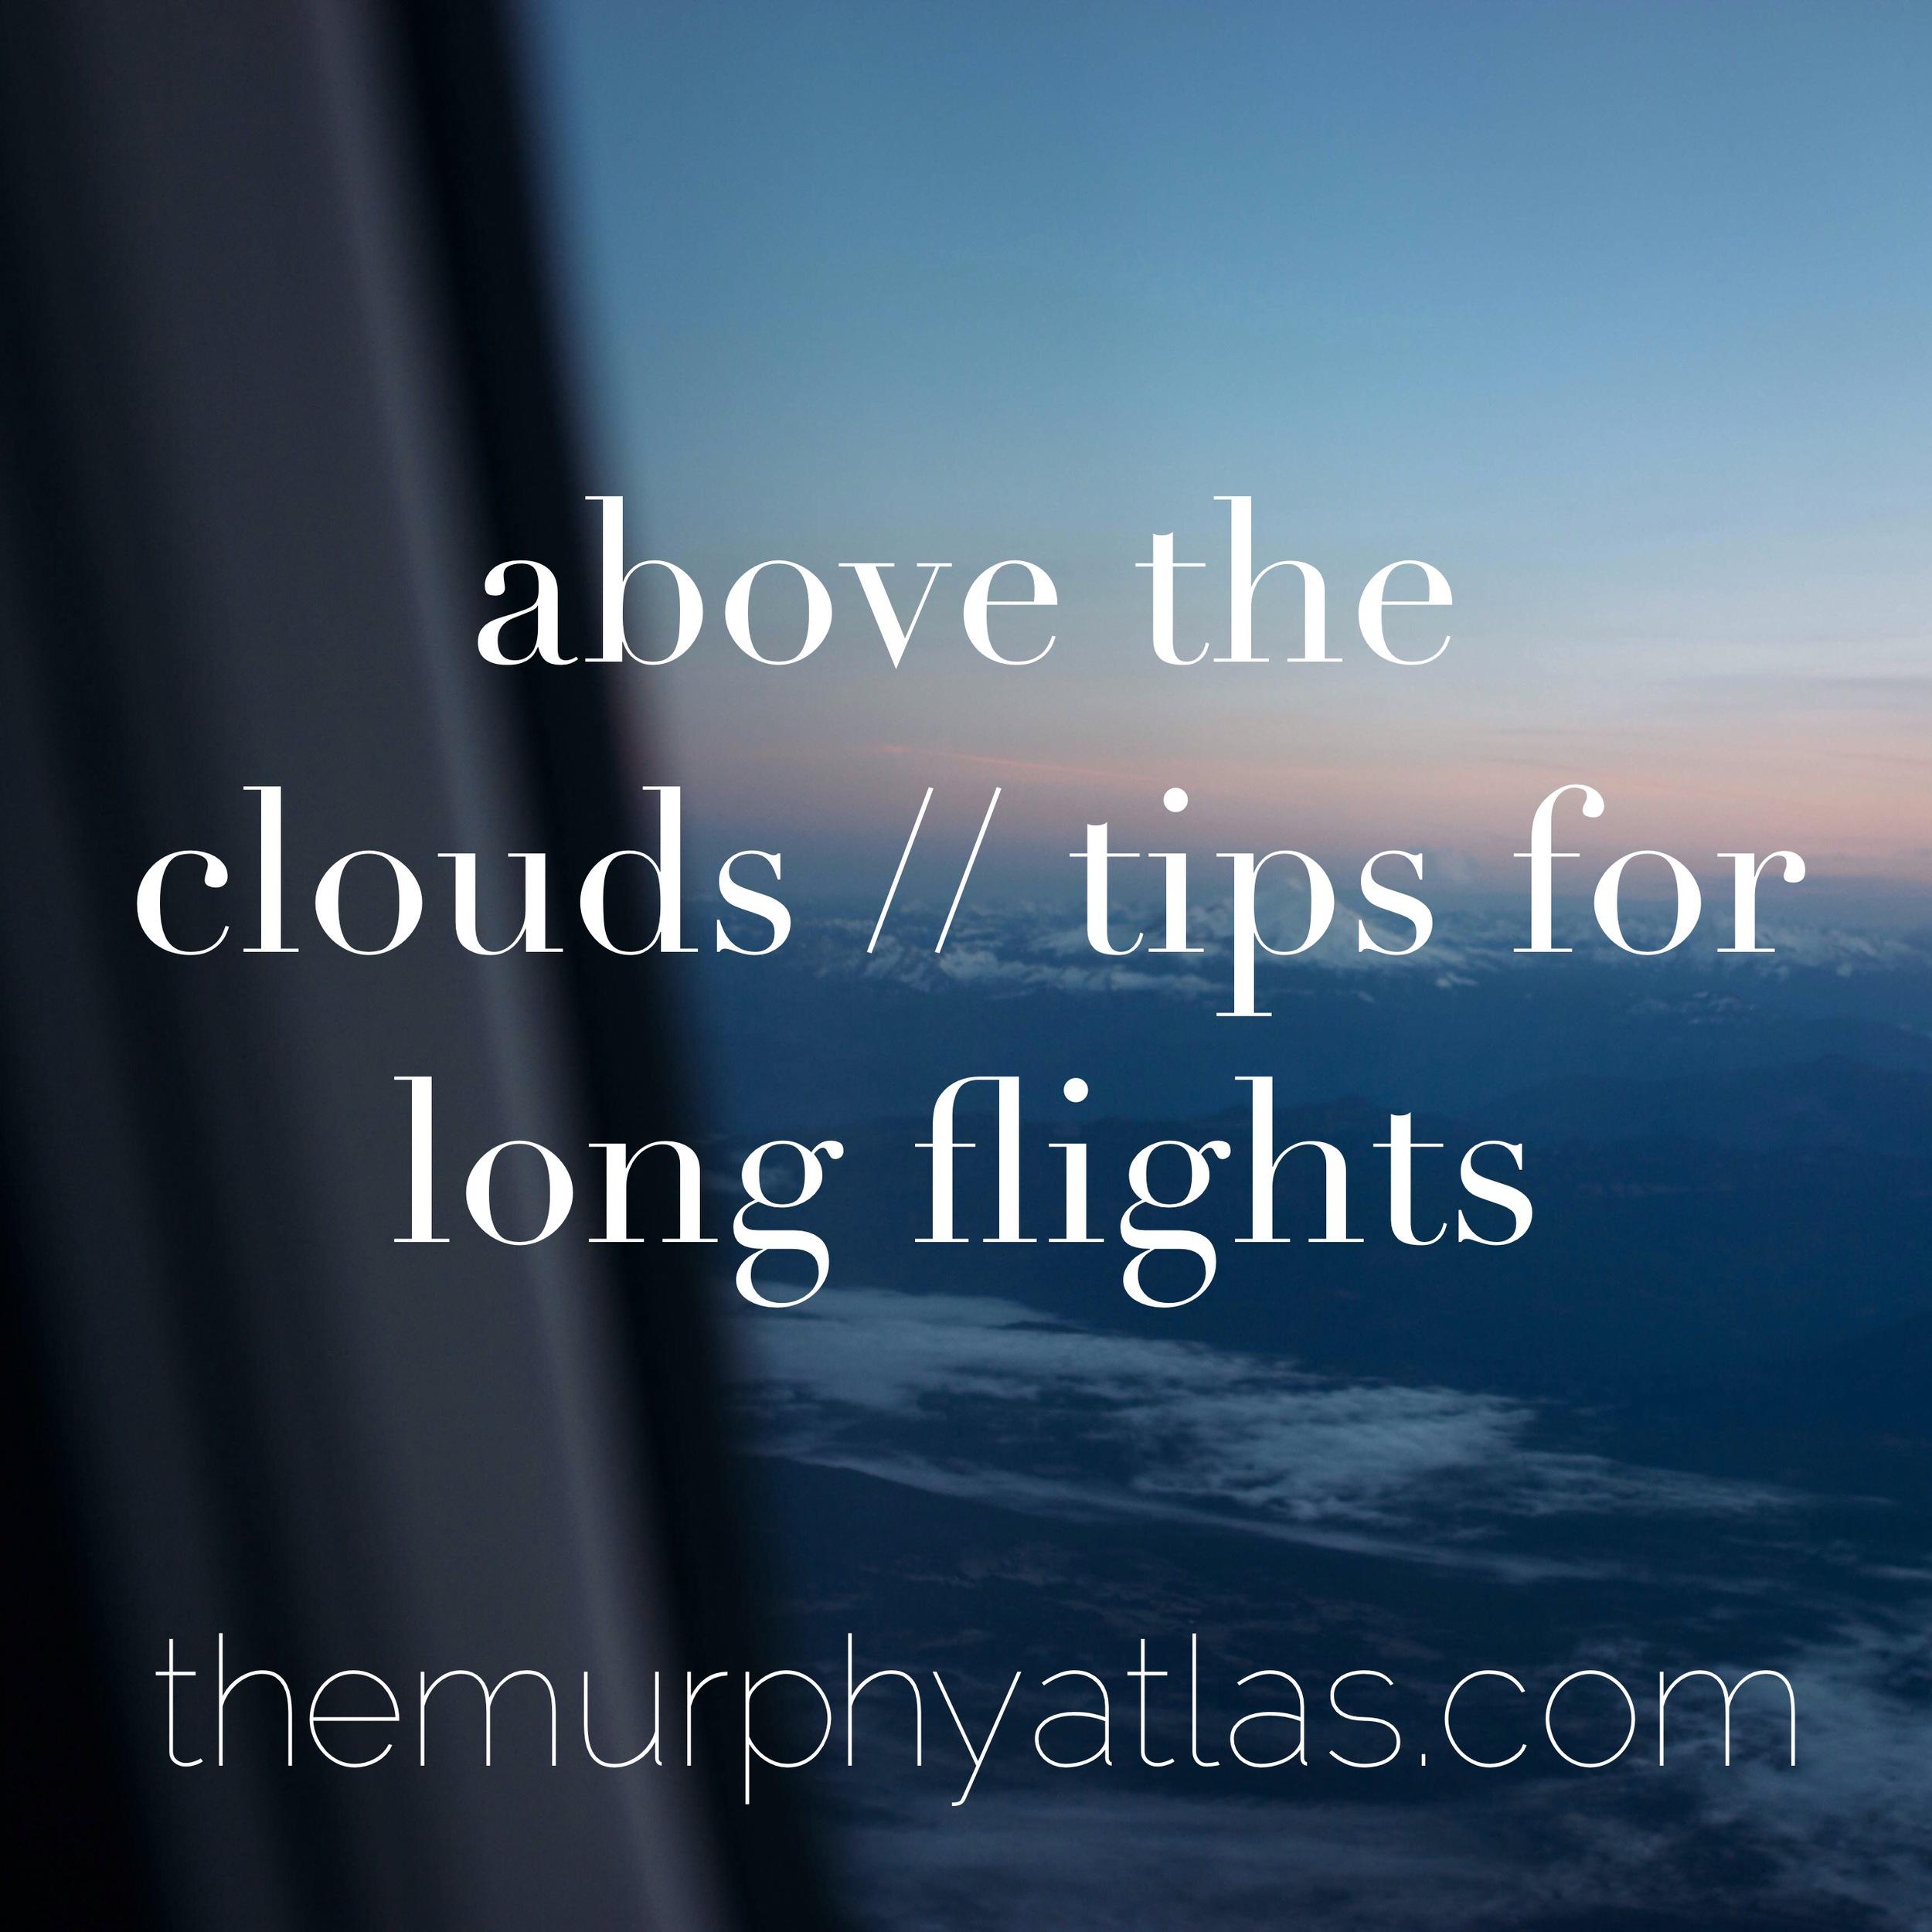 Tips for long flights - The Murphy Atlas